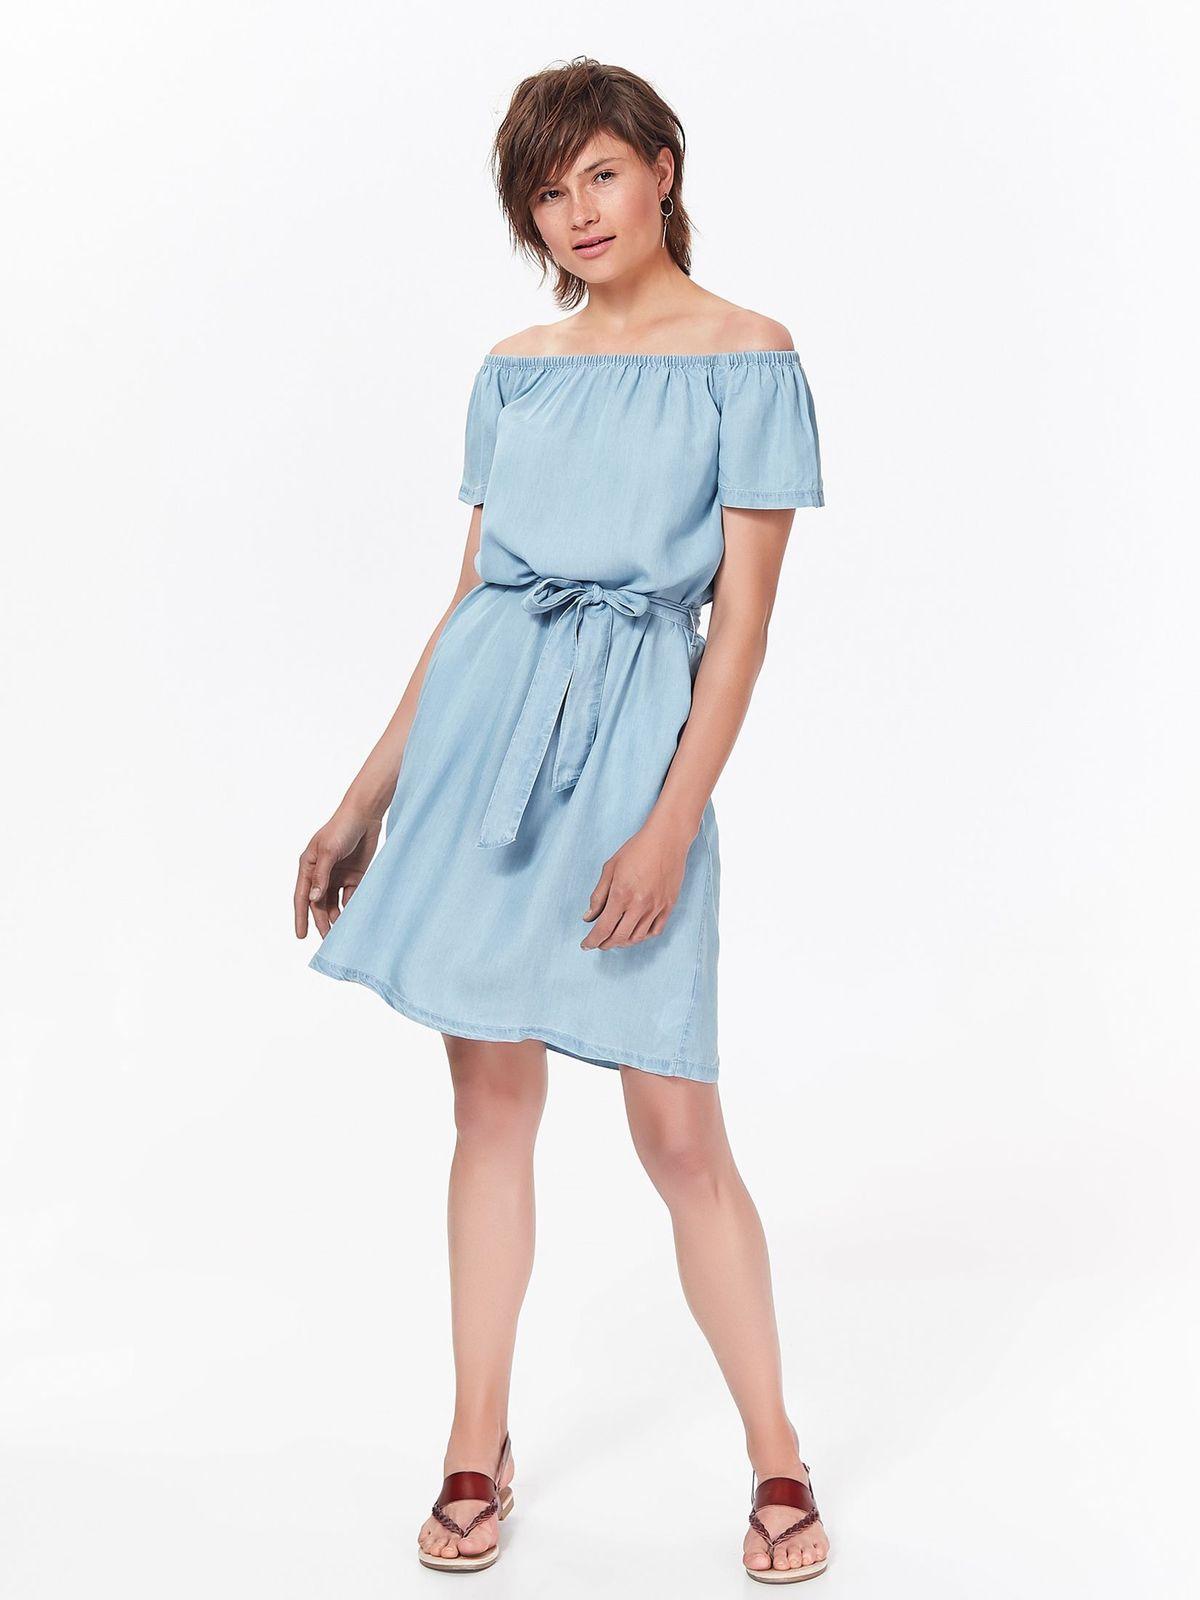 Rochie Top Secret albastra-deschis de zi cu croi larg din denim accesorizata cu cordon